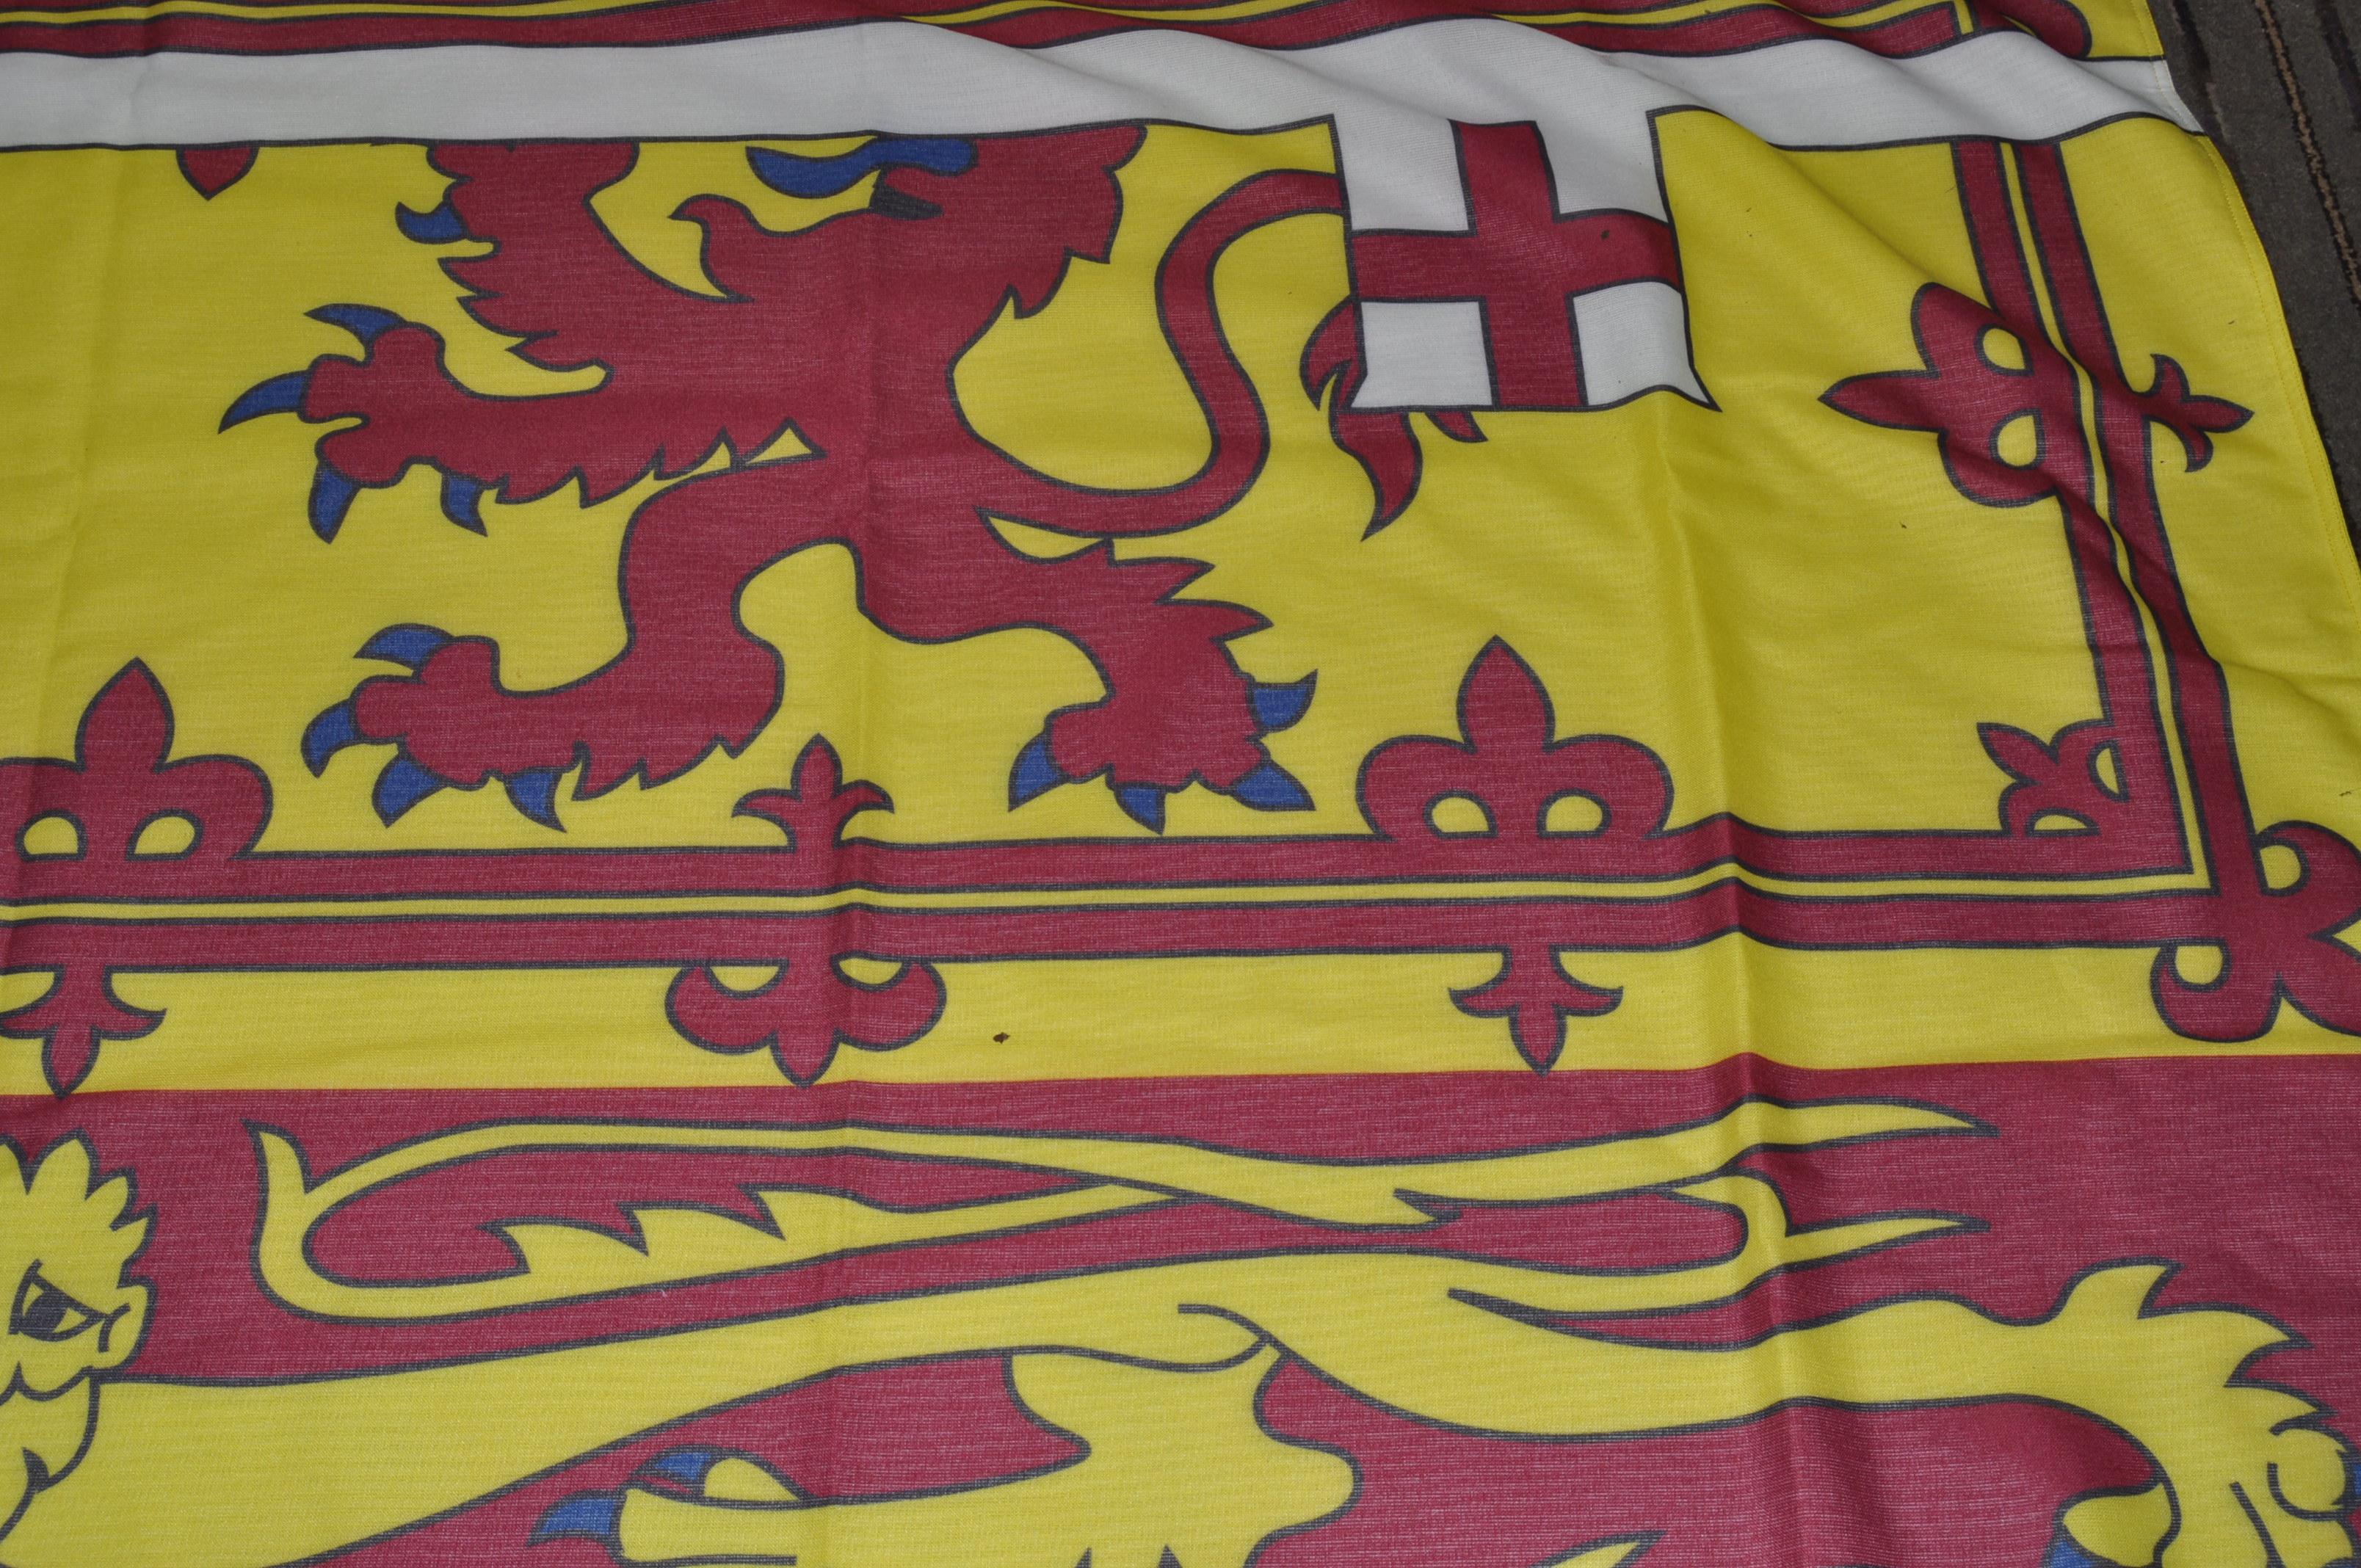 LARGE ROYAL STANDARD OF THE UNITED KINGDOM FLAG - Image 4 of 7